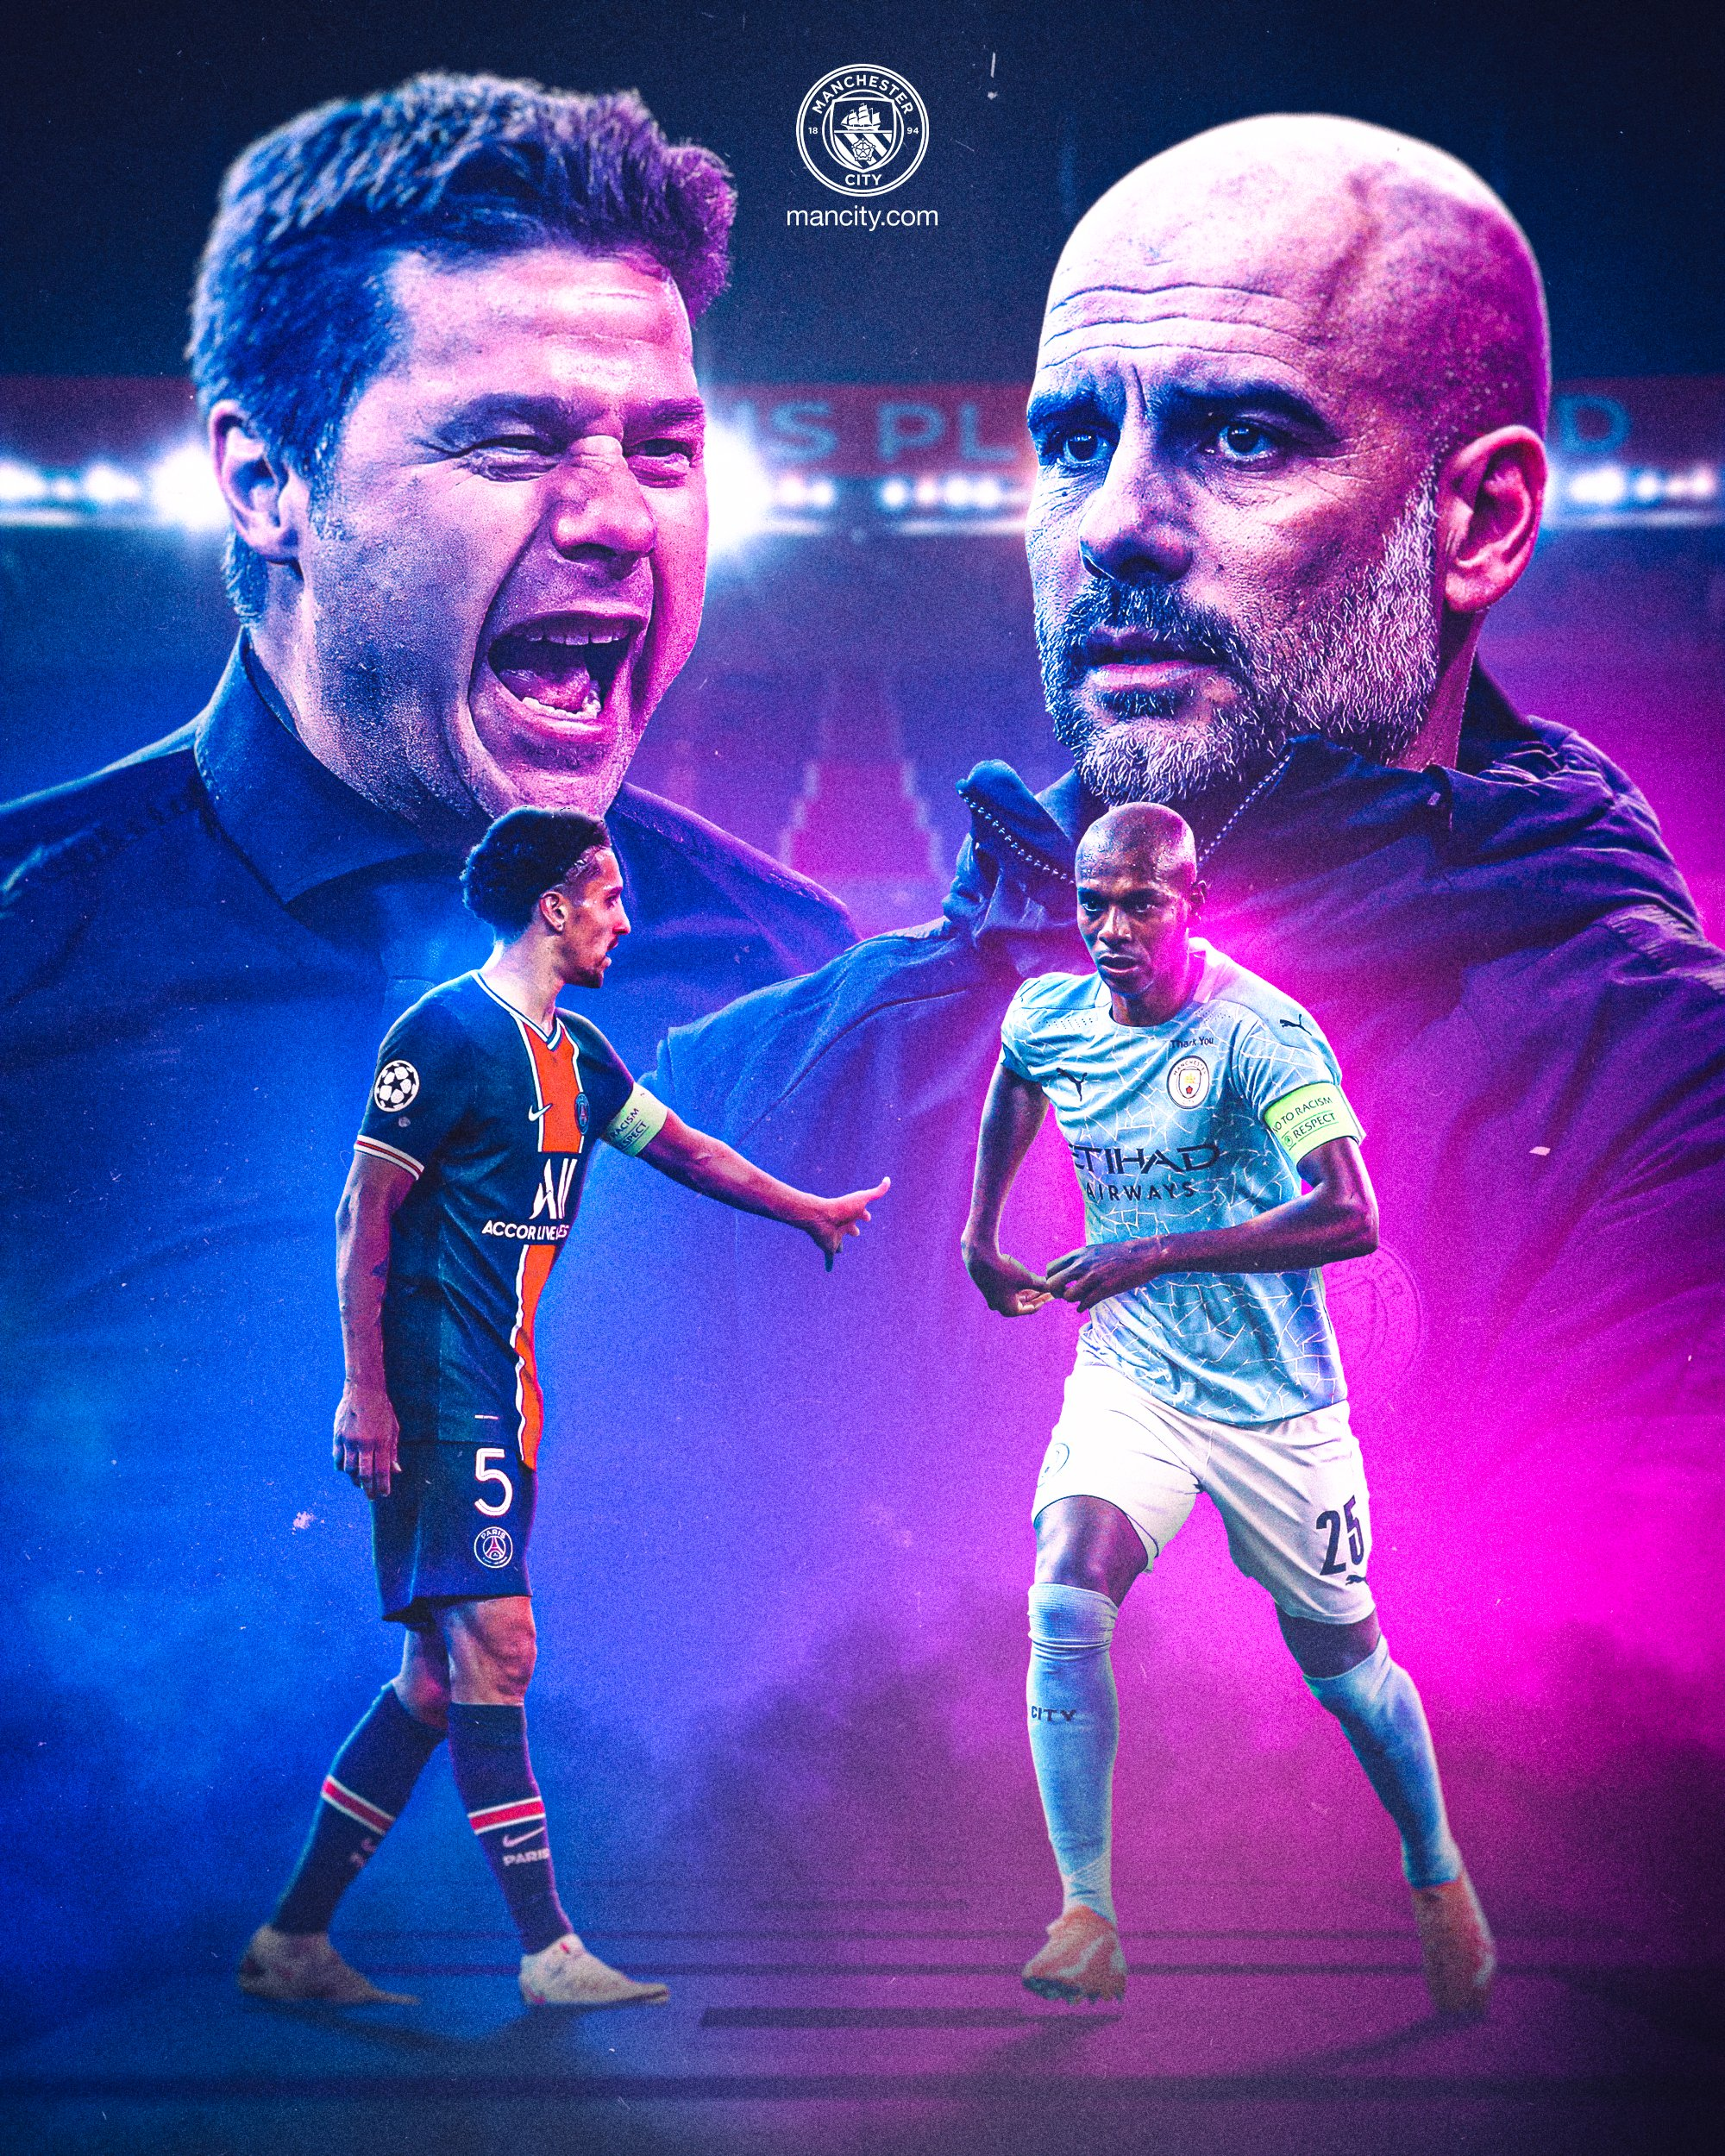 Paris Saint Germain vs Manchester City: Prediction, Lineups, Team News, Betting Tips & Match Previews